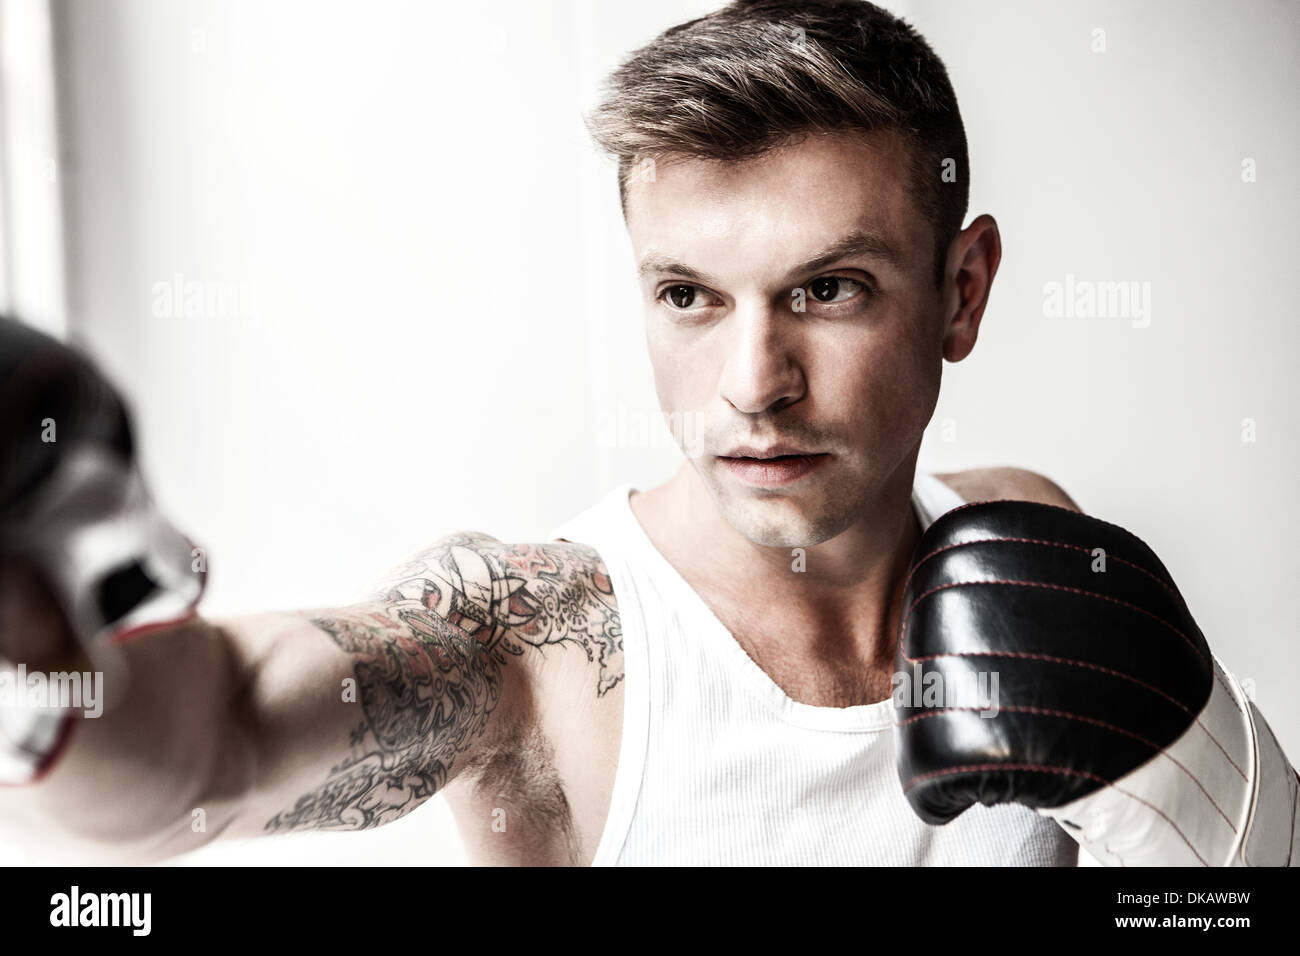 Studio shot of mid adult man boxing - Stock Image